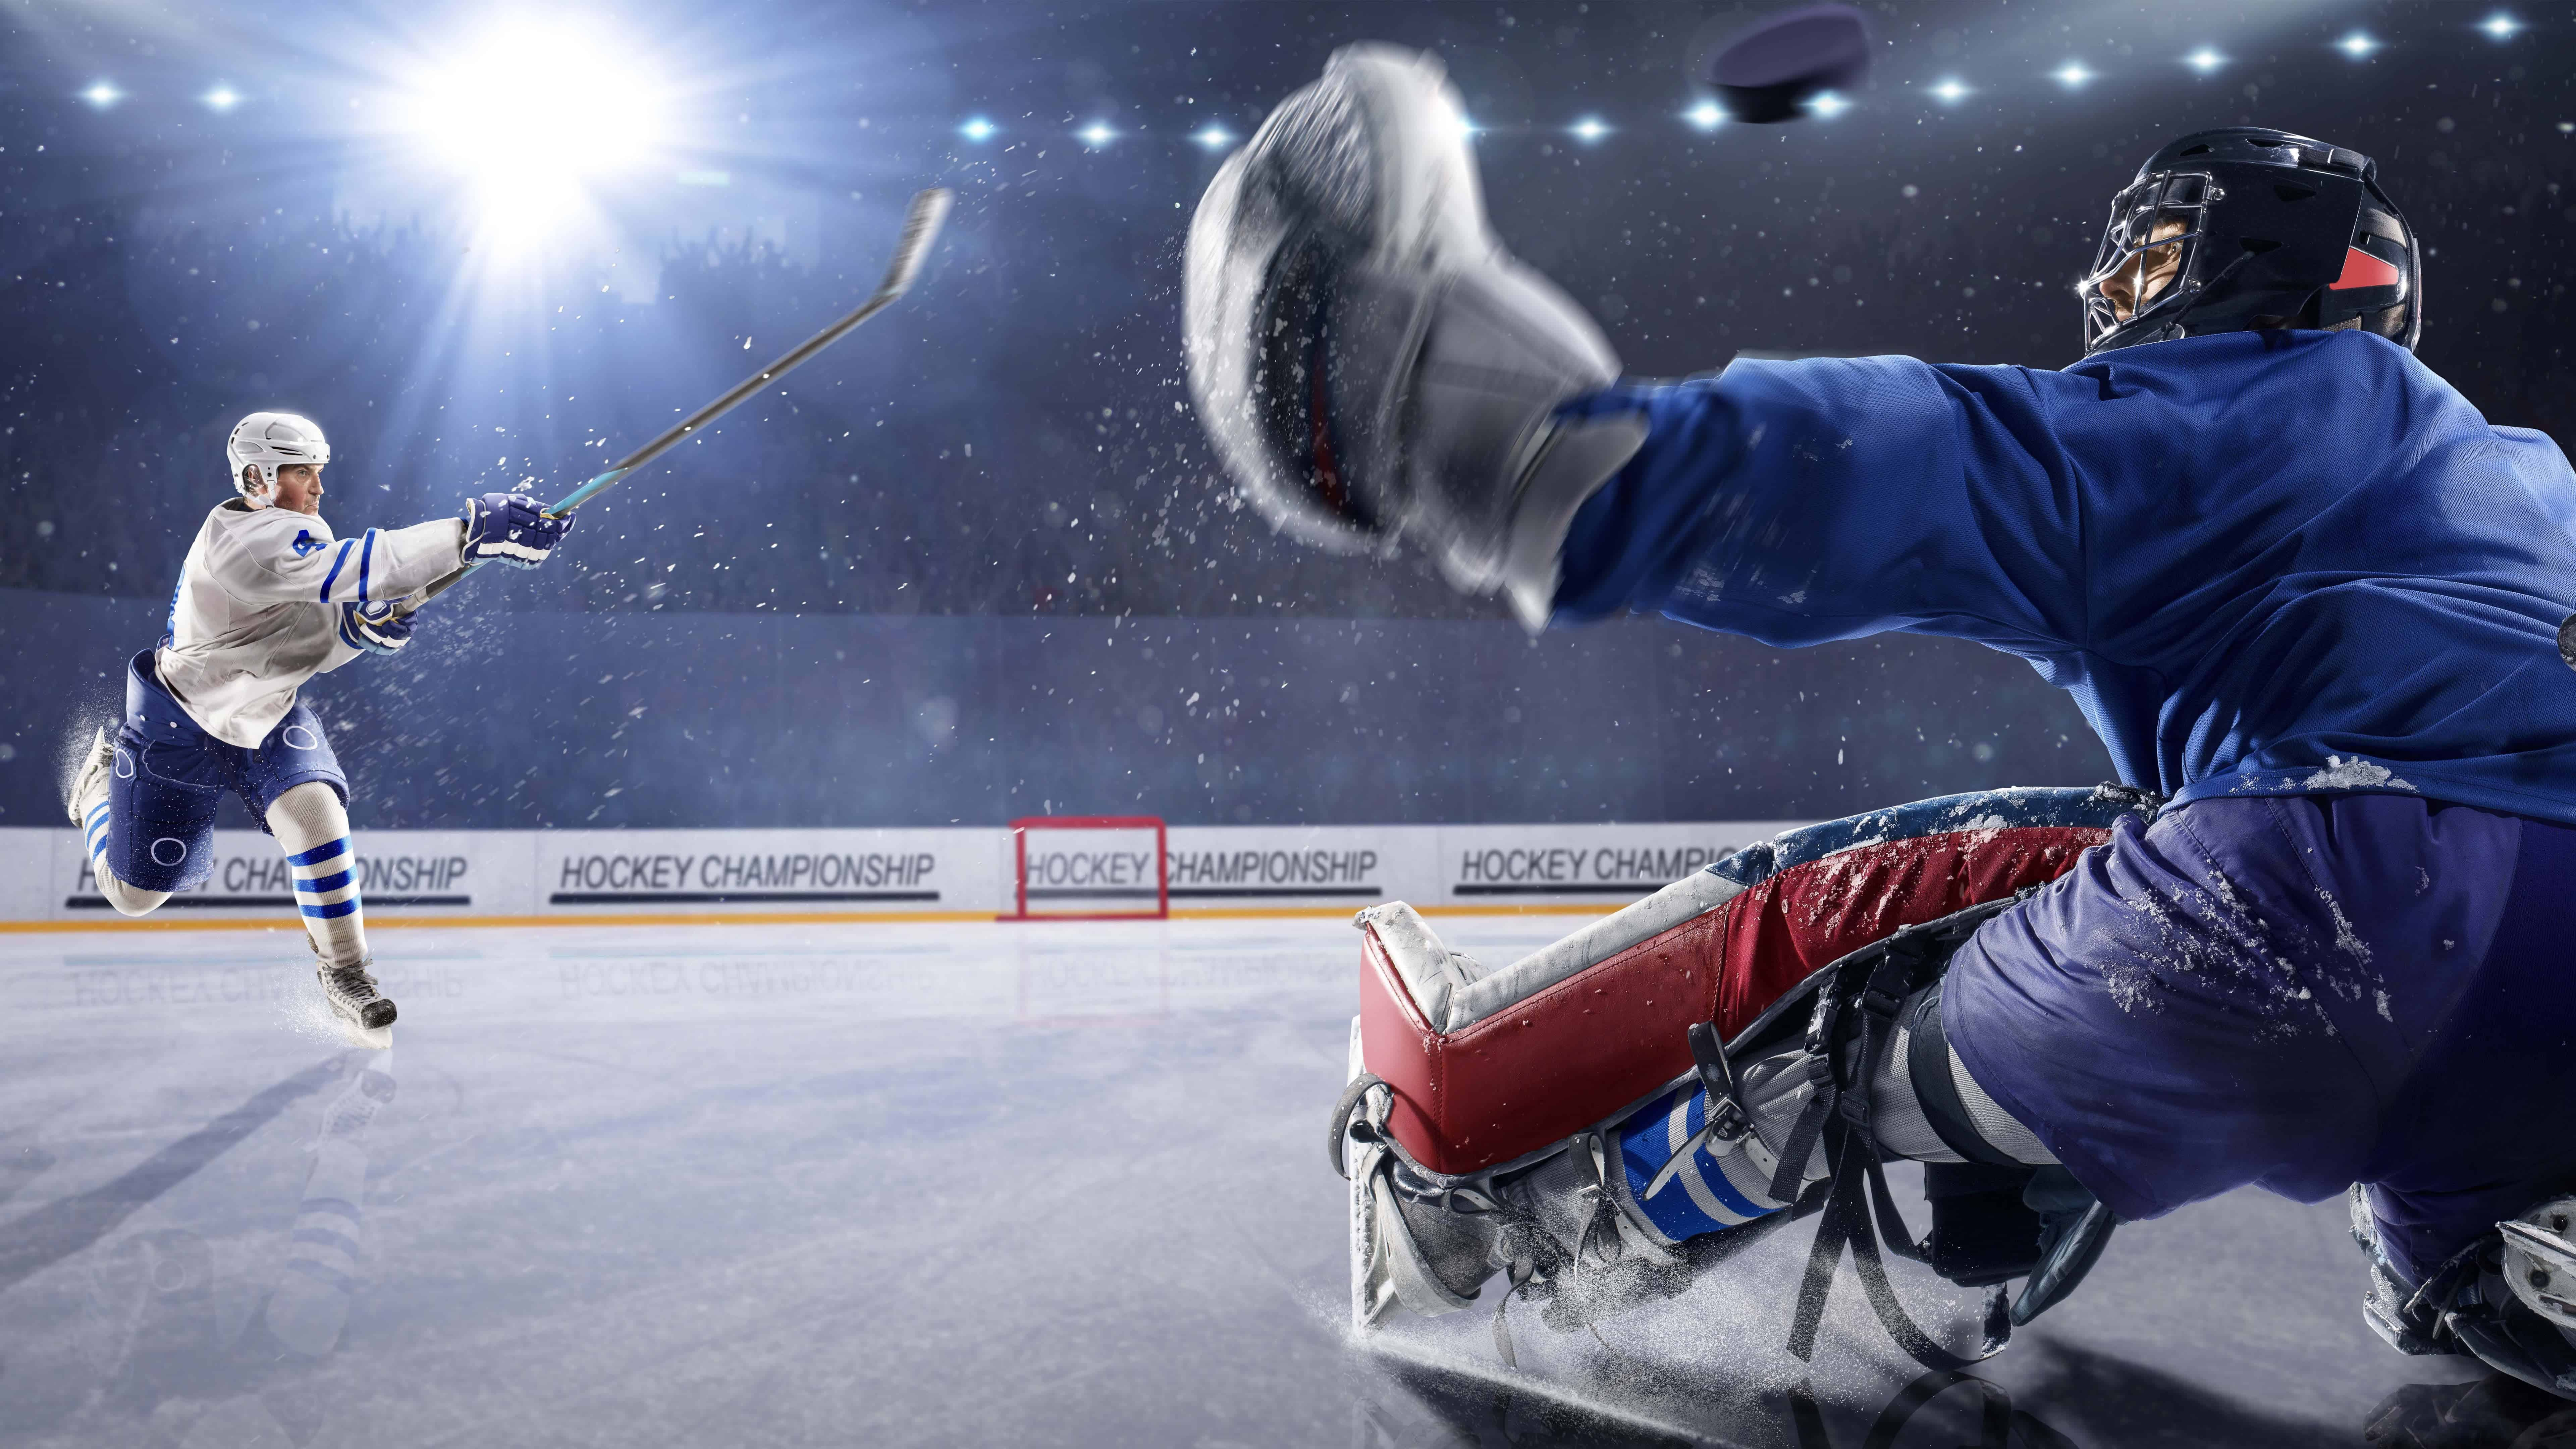 hockey player shooting puck at goalie uhd 8k wallpaper